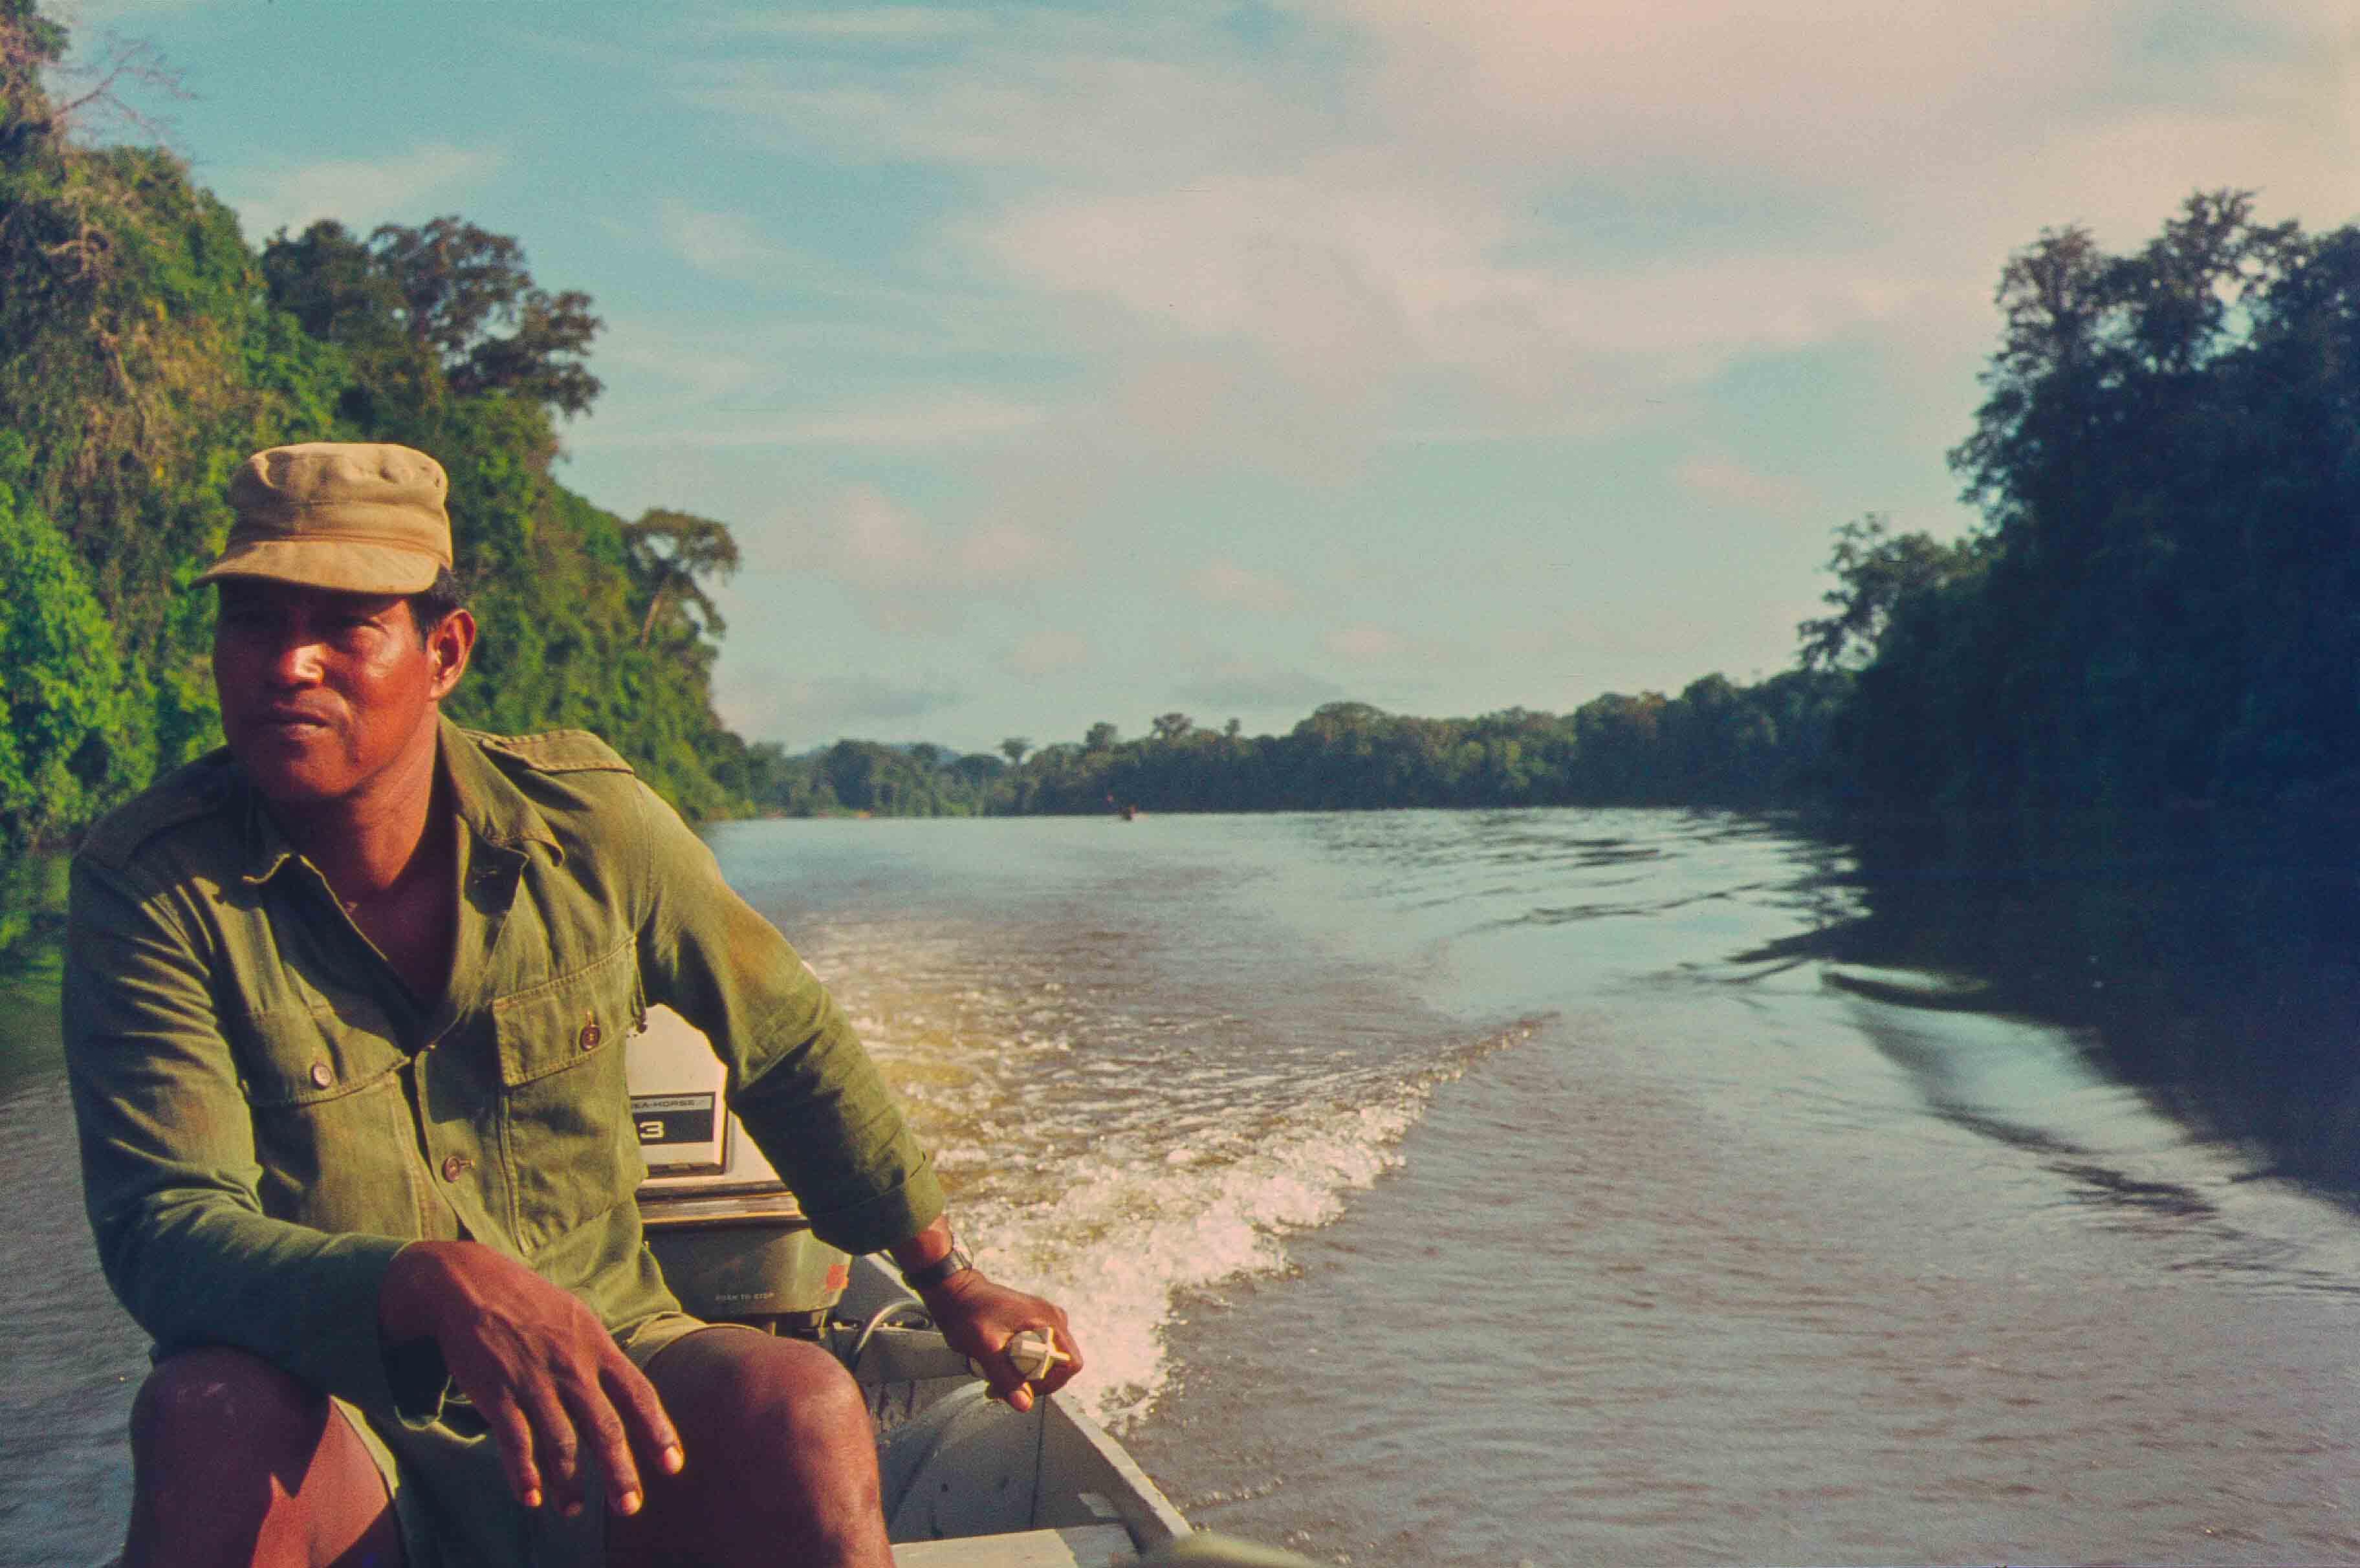 464. Suriname